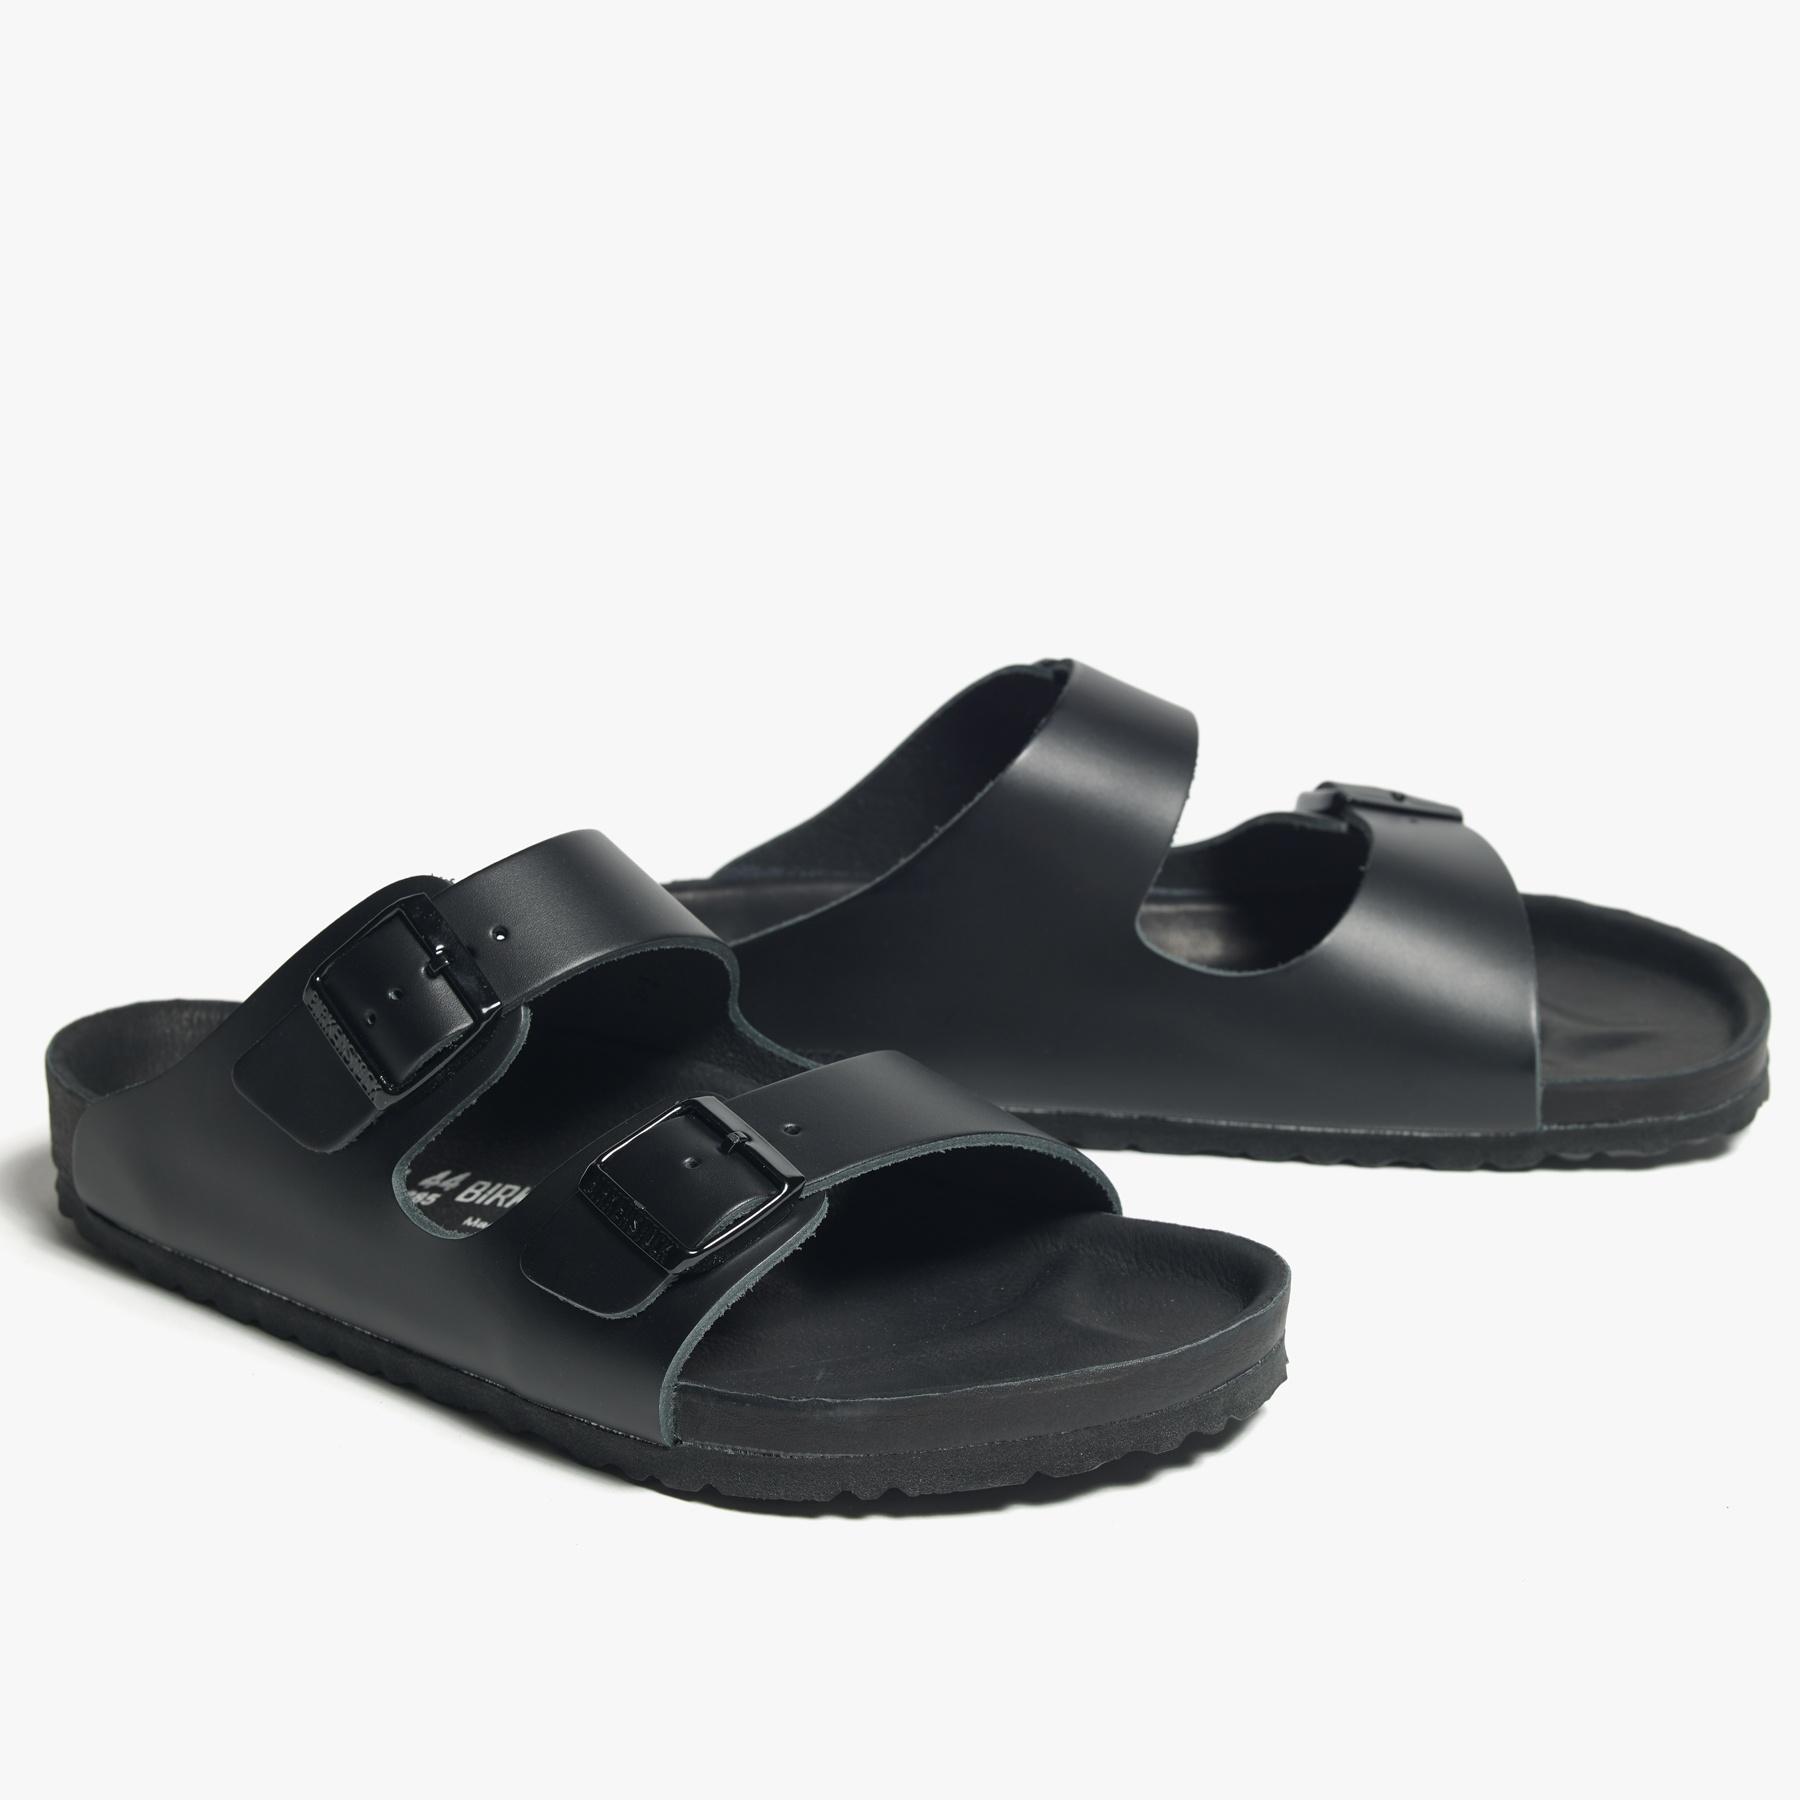 Lyst - James Perse Birkenstock Monterey Leather Sandal - Mens in ... 9f85403aea09